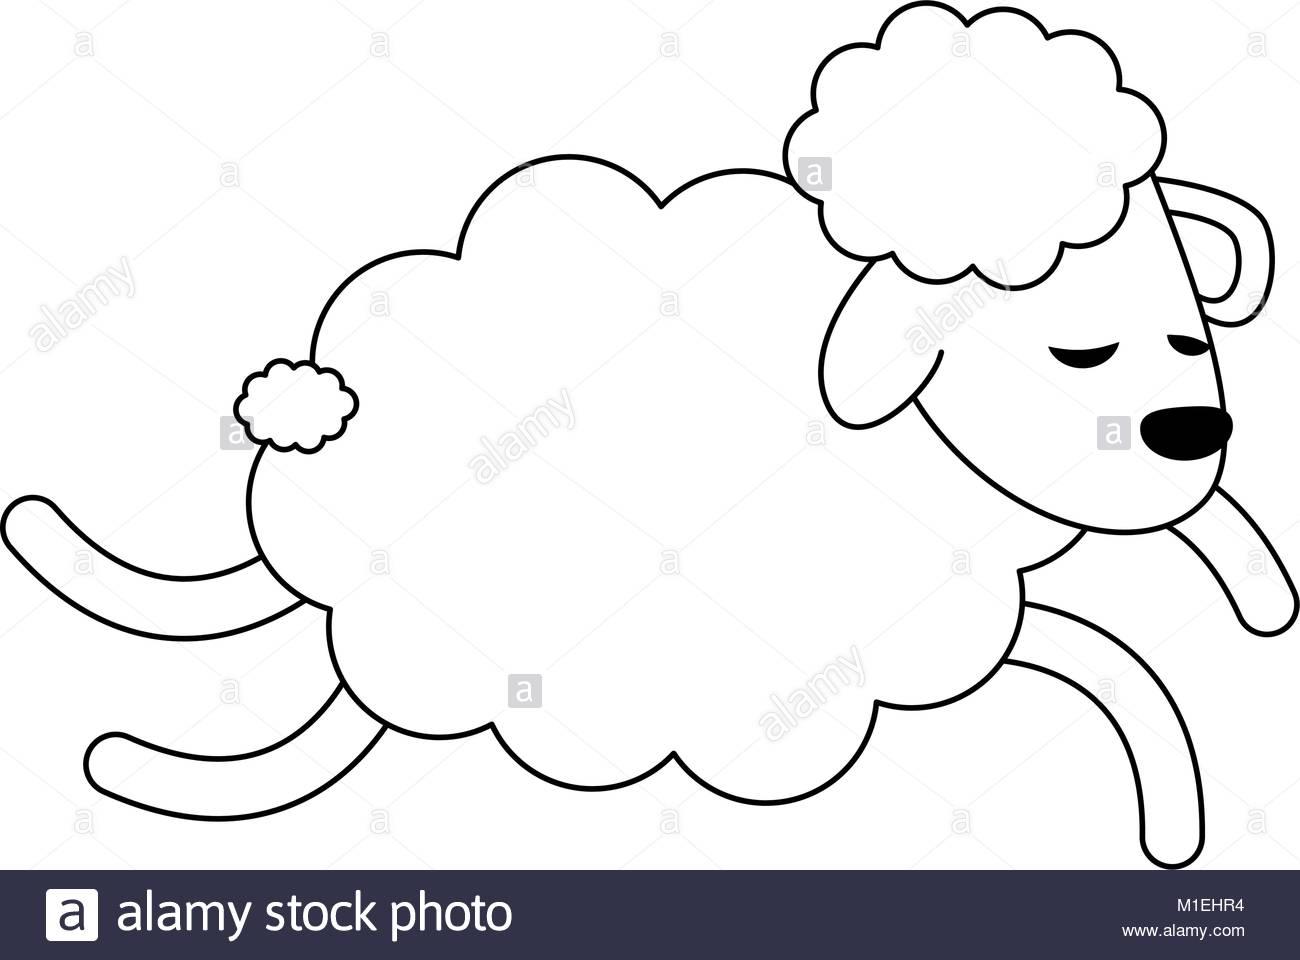 1300x960 Illustration Cute Sheep Lamb Cartoon Stock Photos Amp Illustration